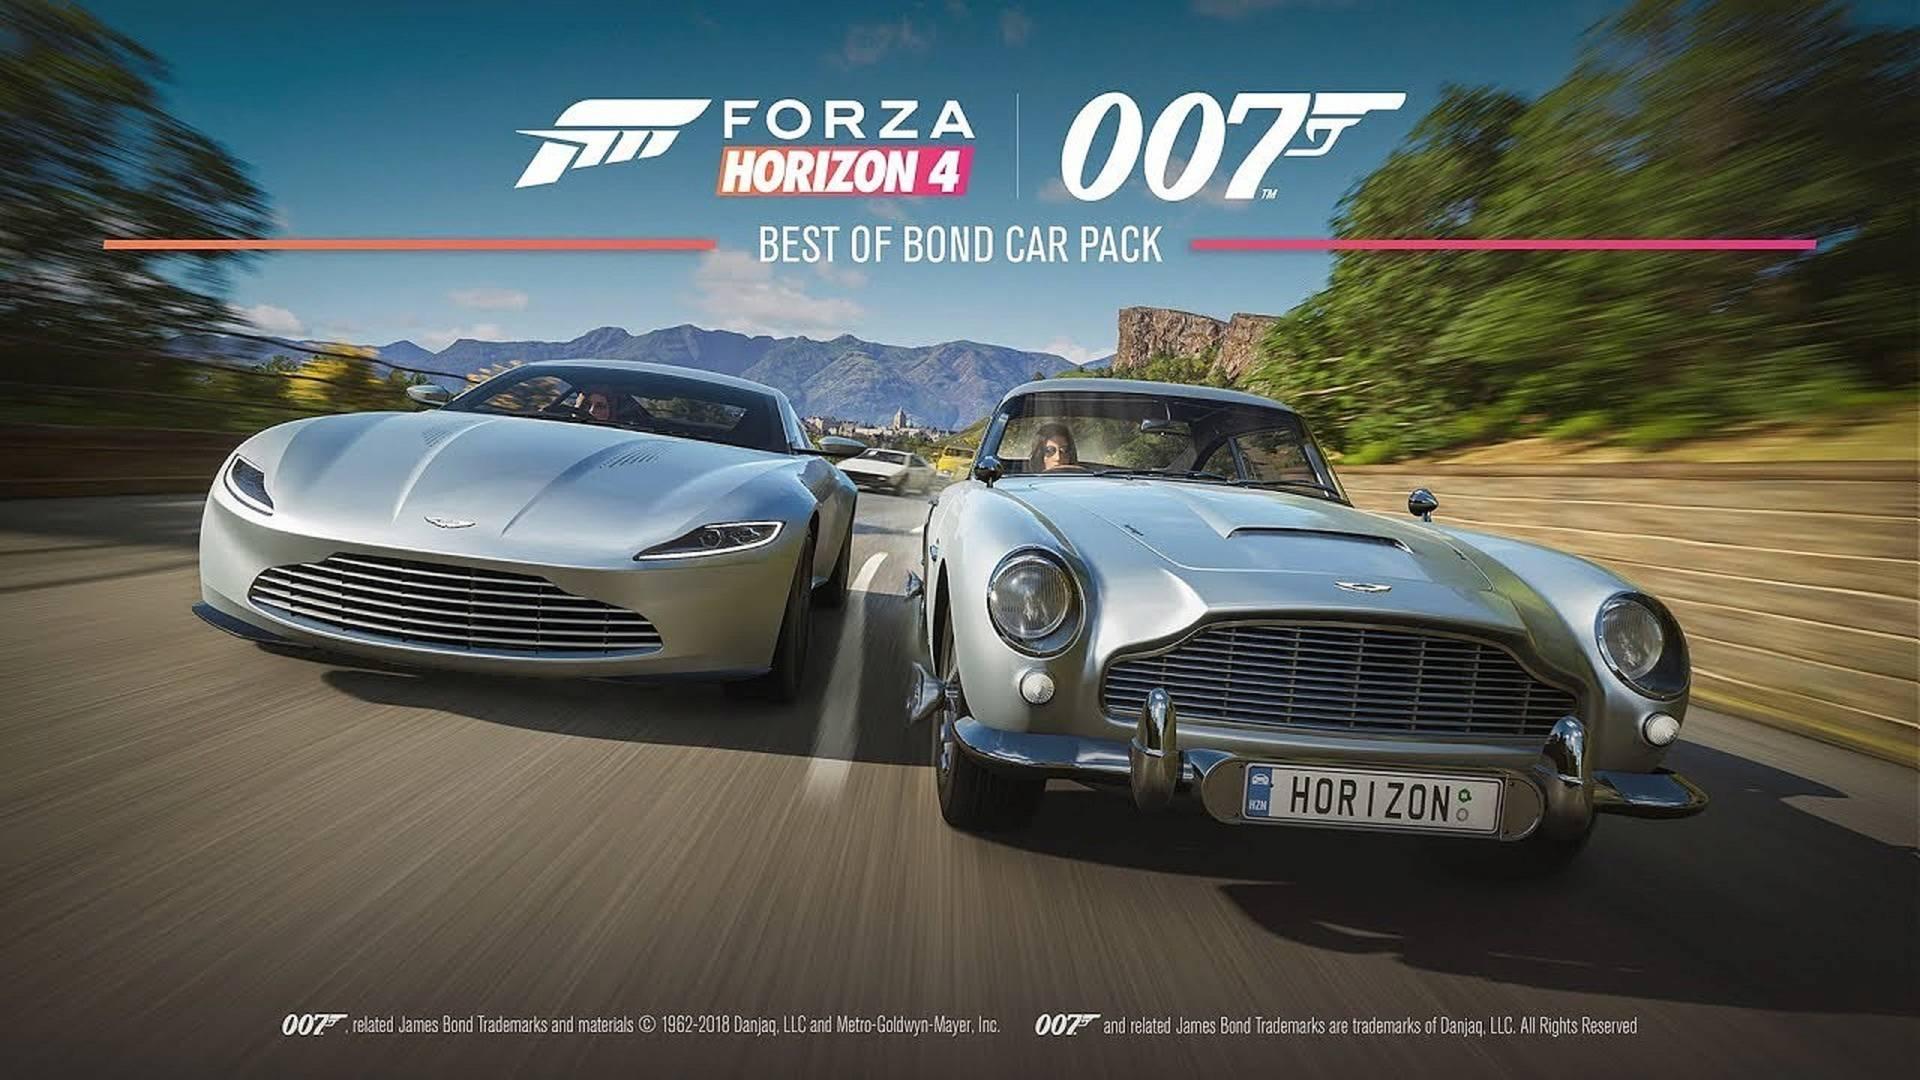 Forza Horizon 4 Best of Bond Car PAck